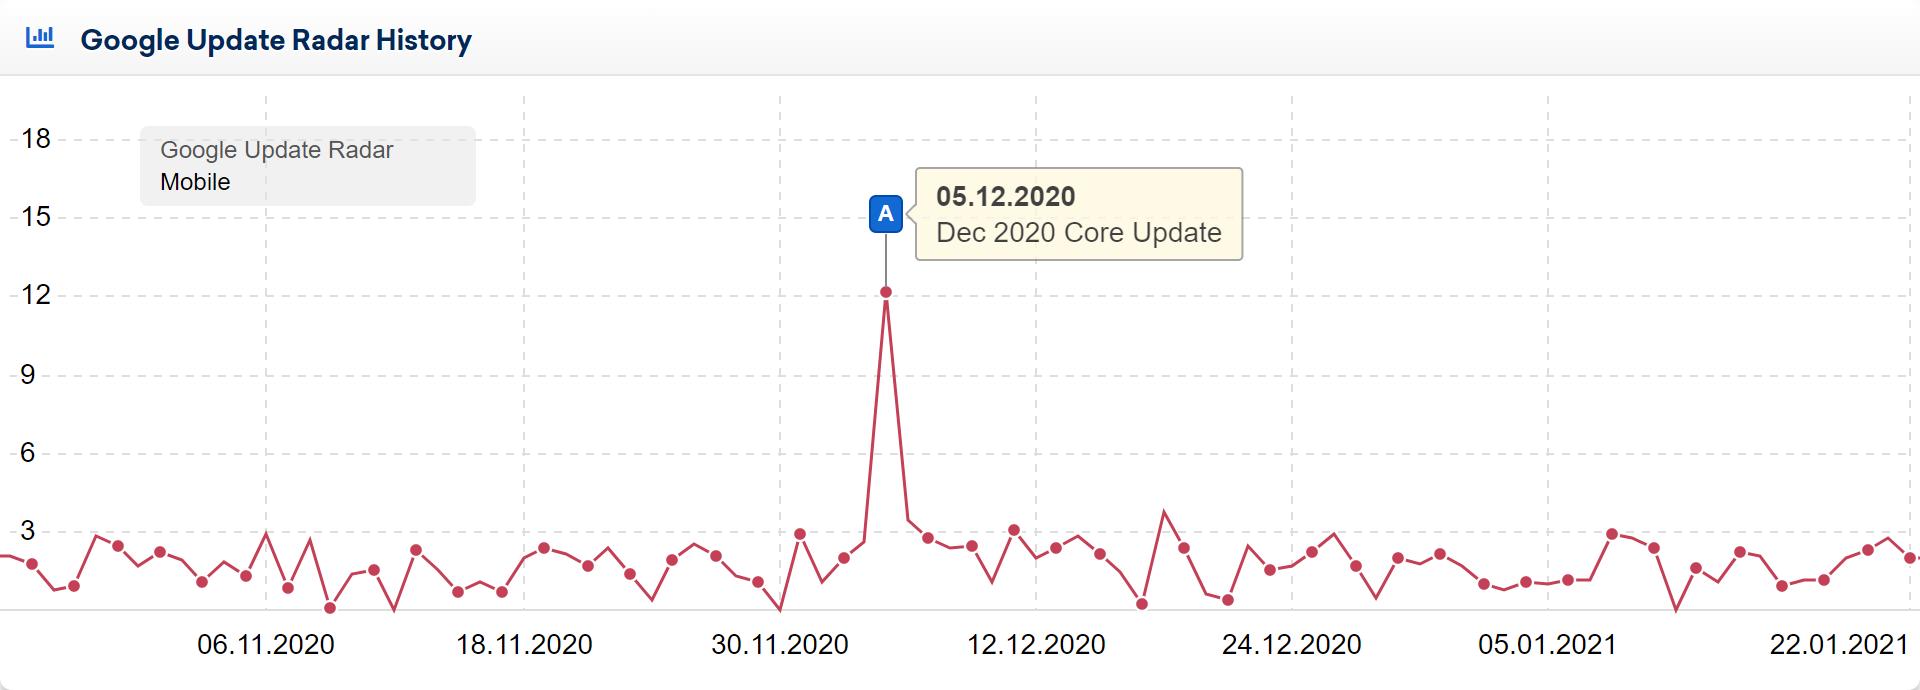 Google Update Radar graphic